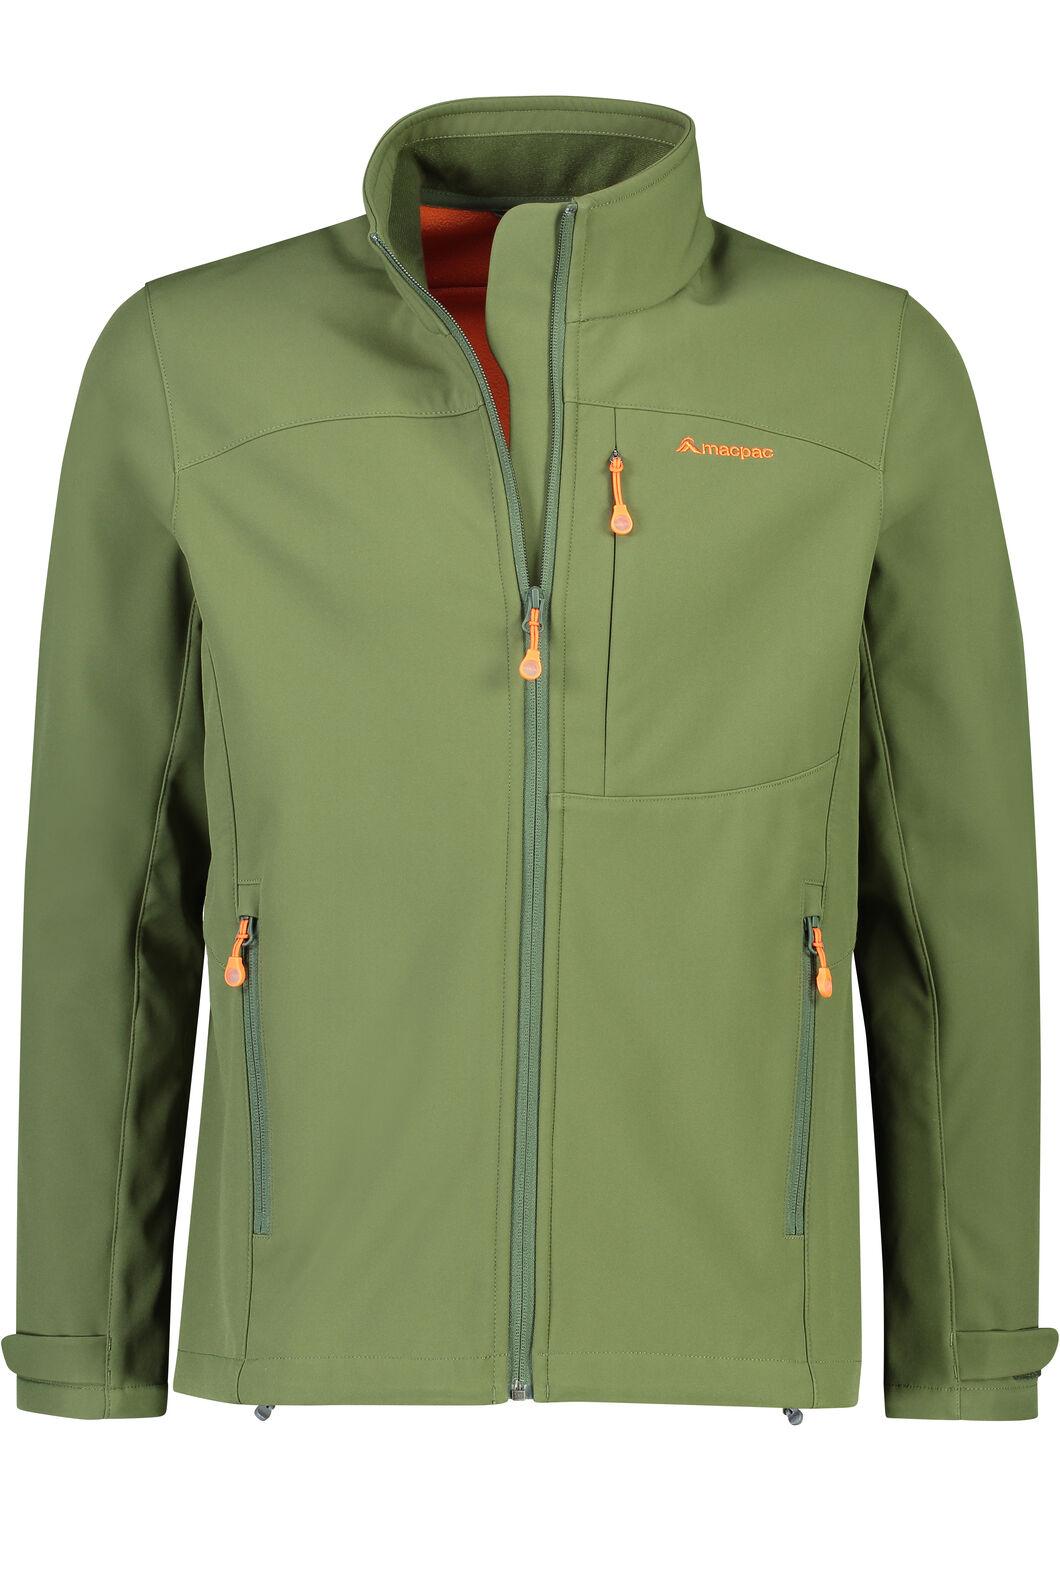 e30ad999 Macpac Sabre Softshell Jacket - Men's, Rifle Green/Koi, ...